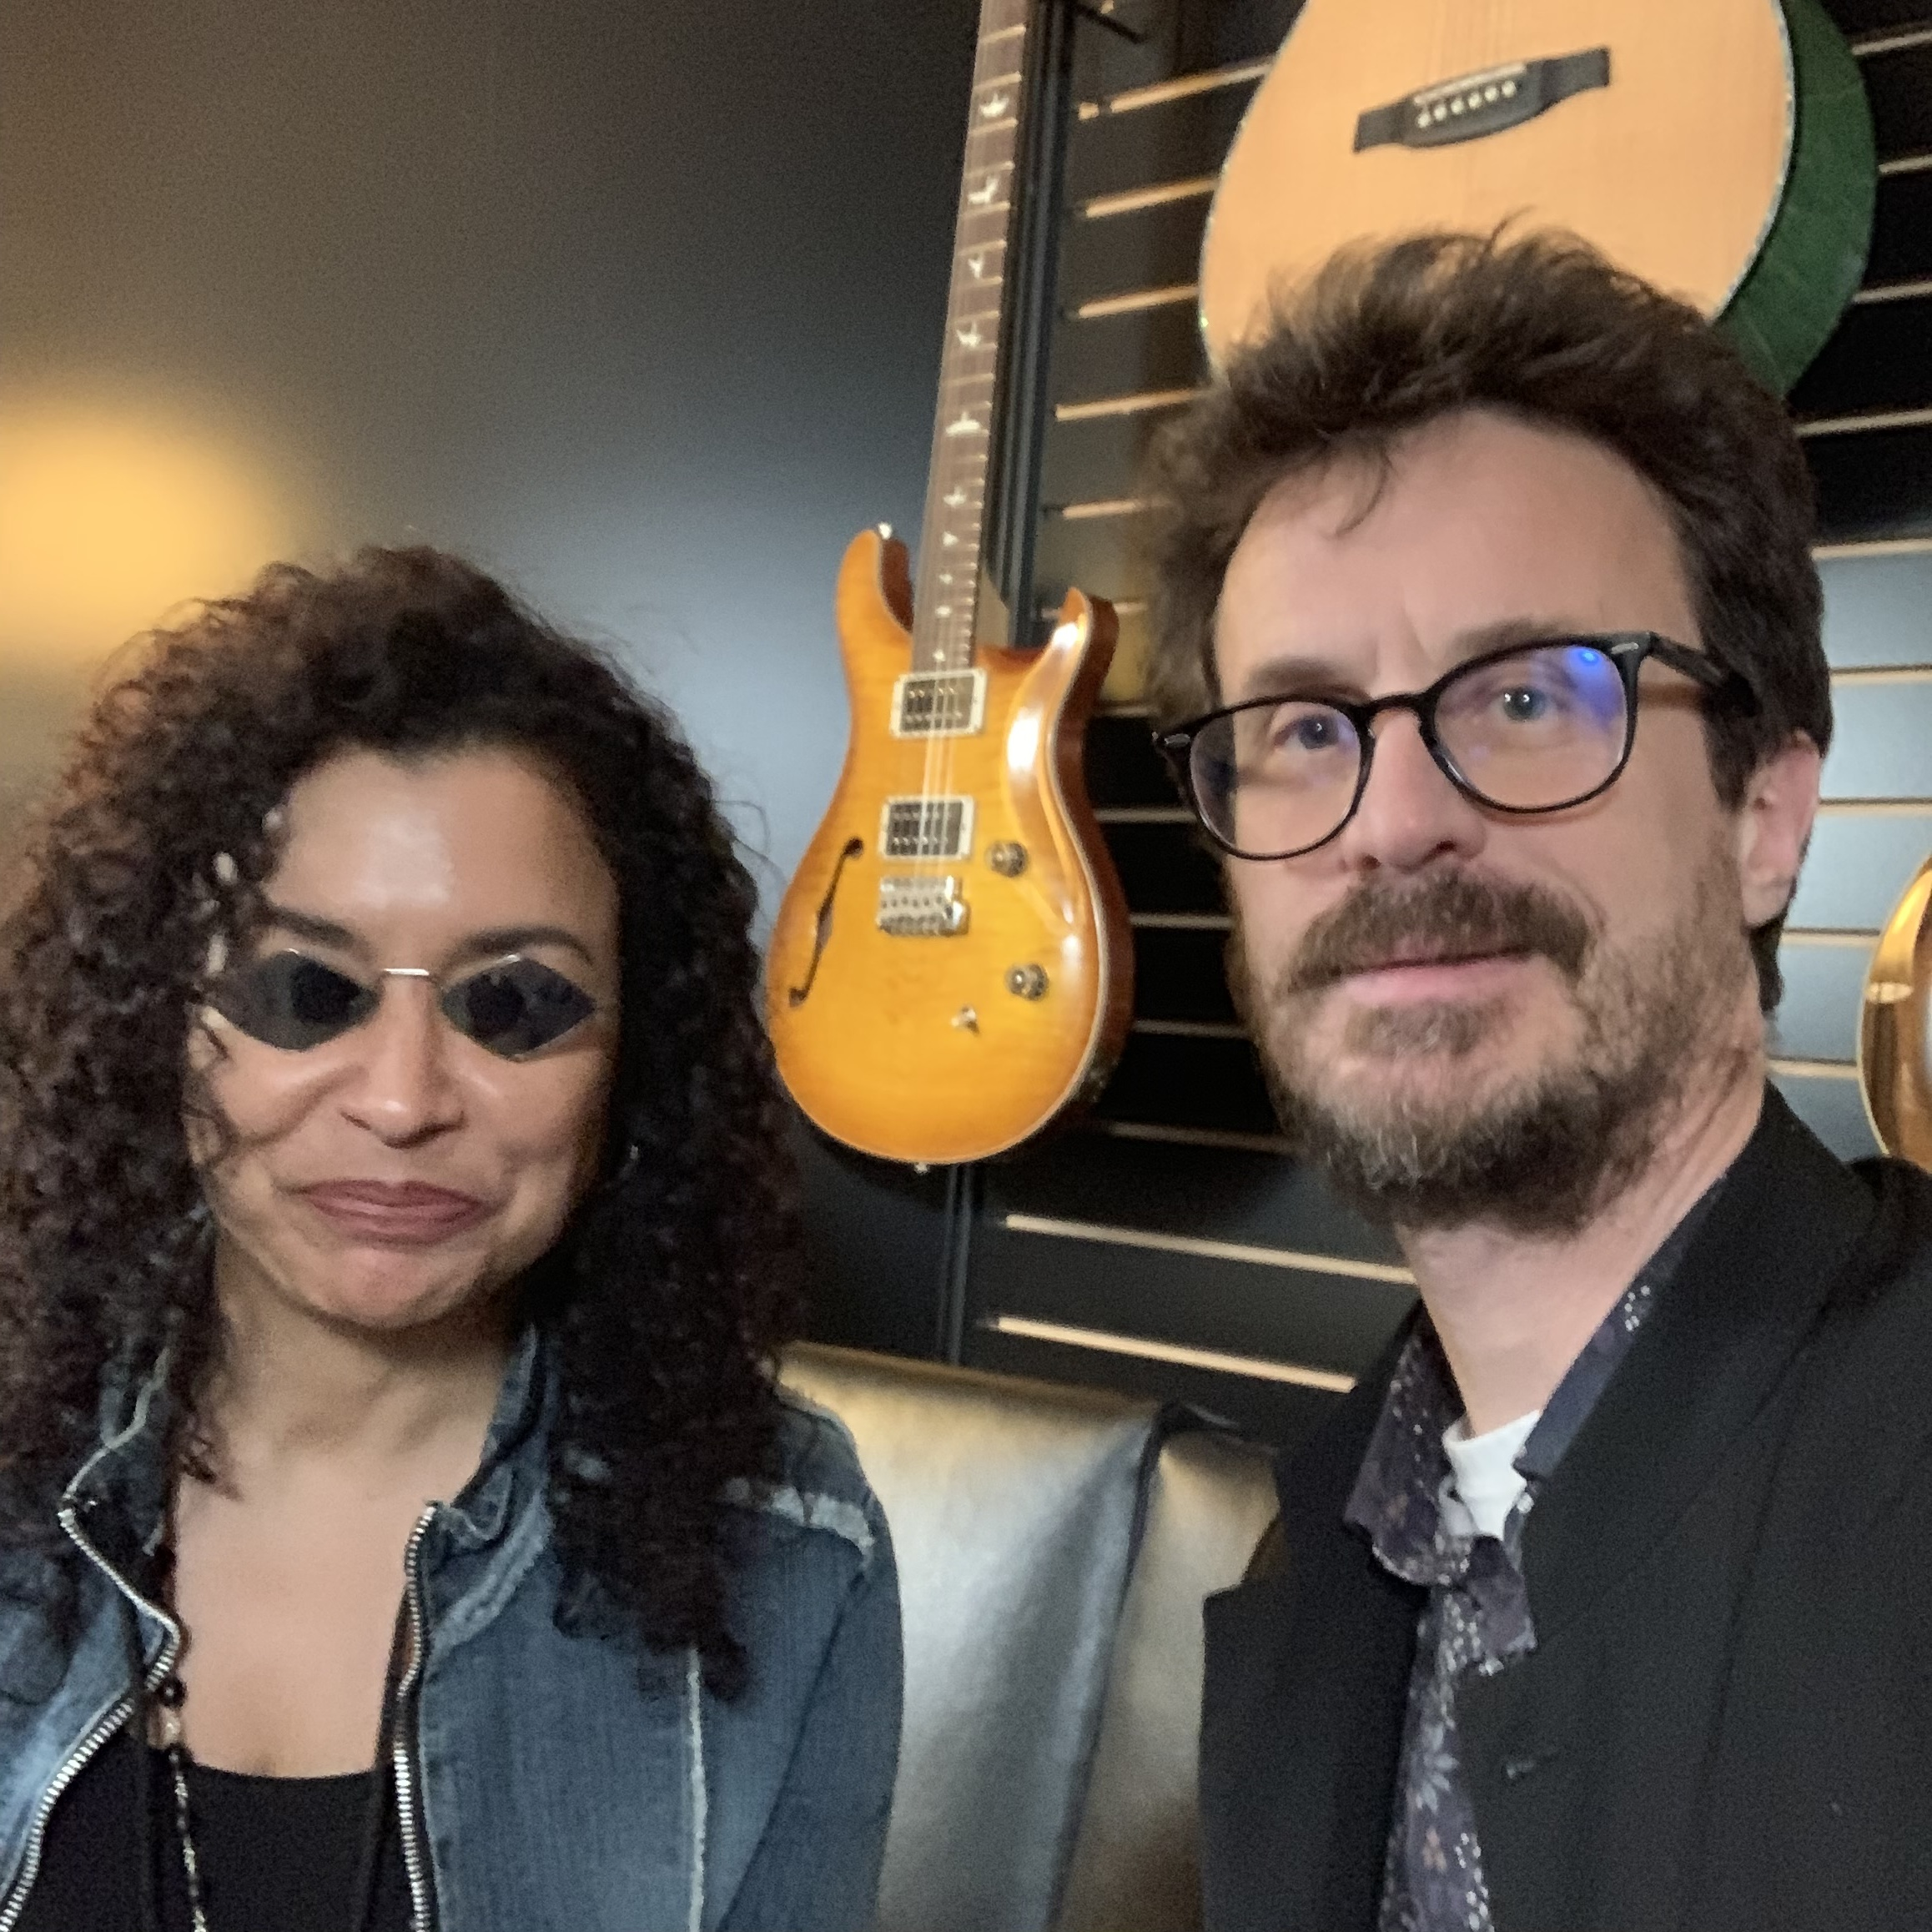 Interview Rhonda Smith - Bassiste de Prince et Jeff Beck - Winter NAMM 2019